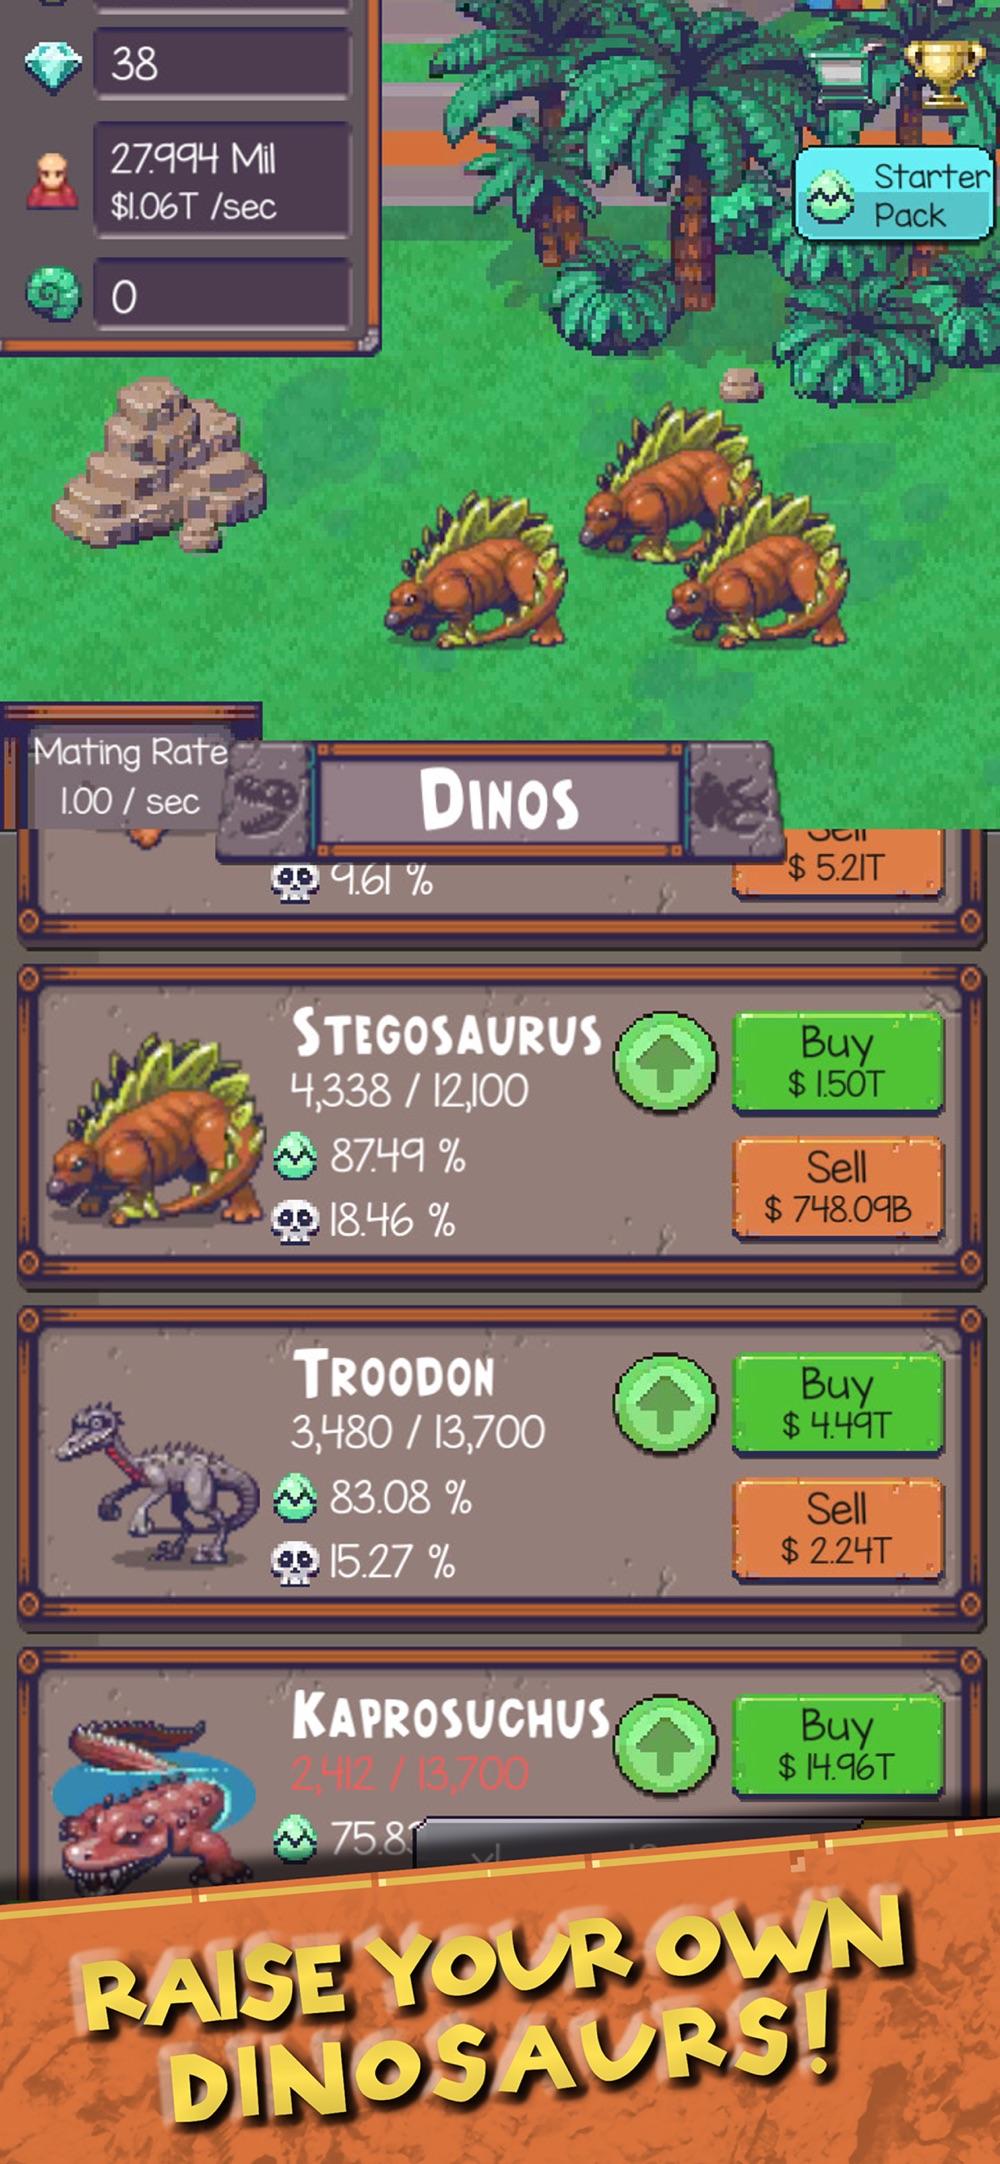 Idle Dino Zoo hack tool